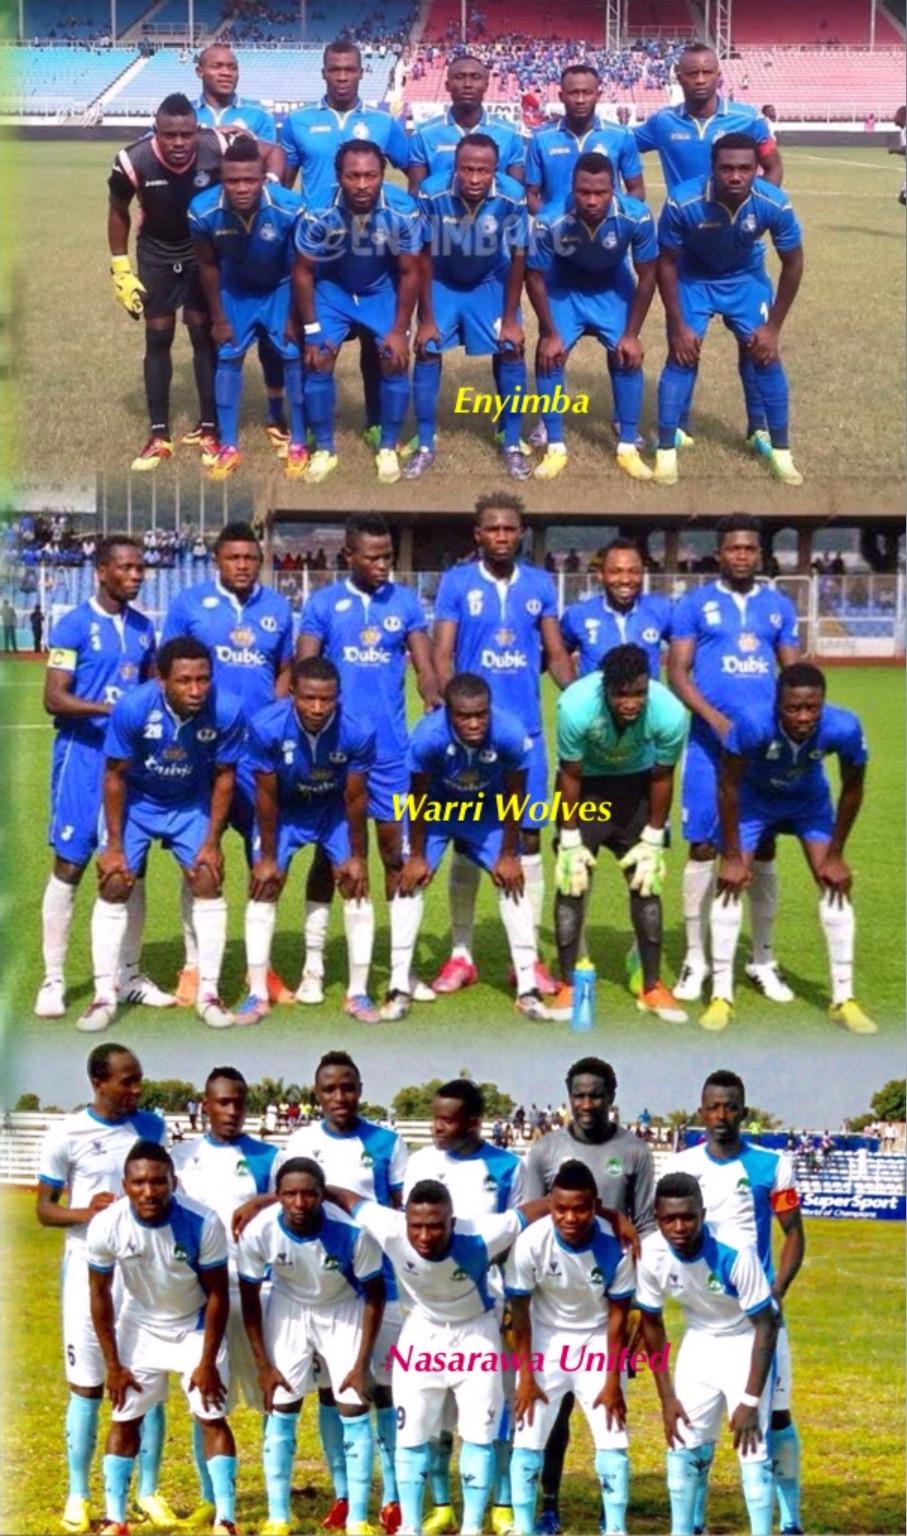 LMC Reschedules League Matches Of Enyimba, Wolves, Nasarawa